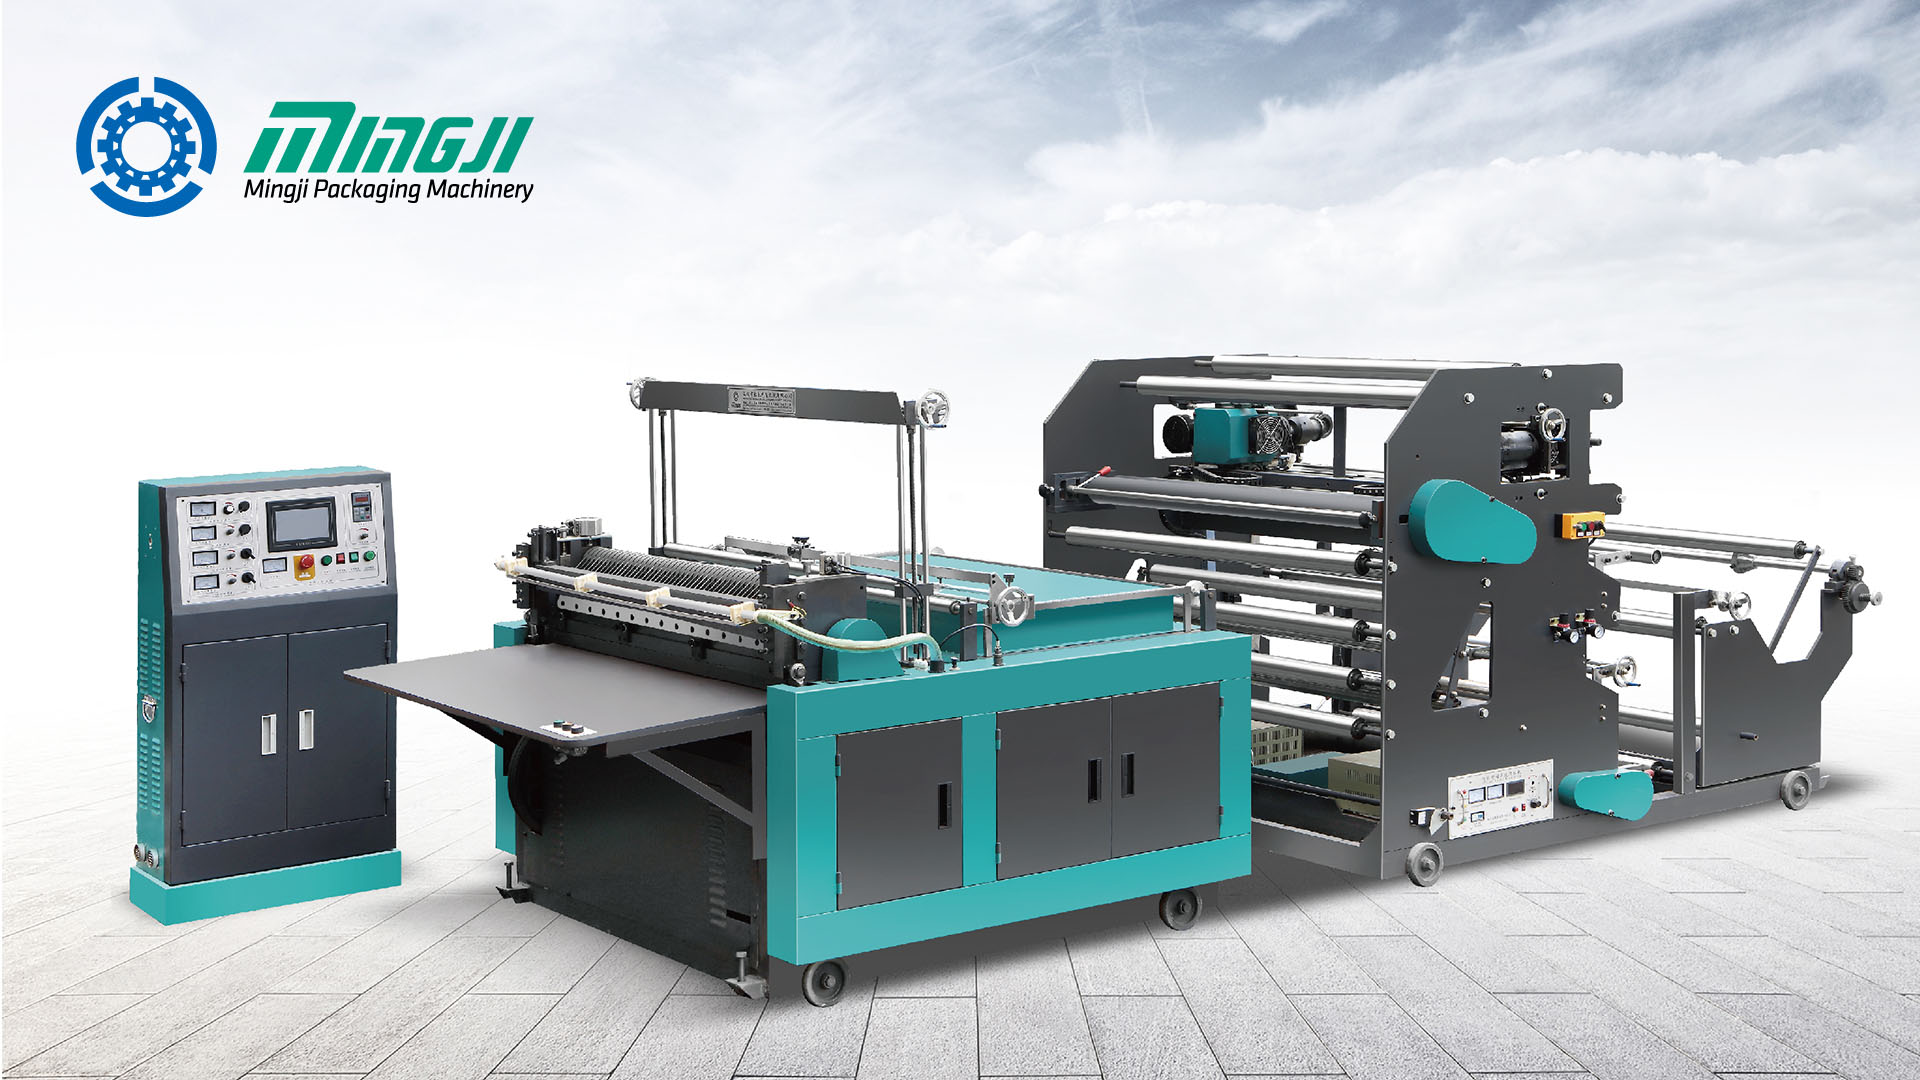 MJC800-1200 - Otomatik Dokumasız Çapraz Kesme Makinesi